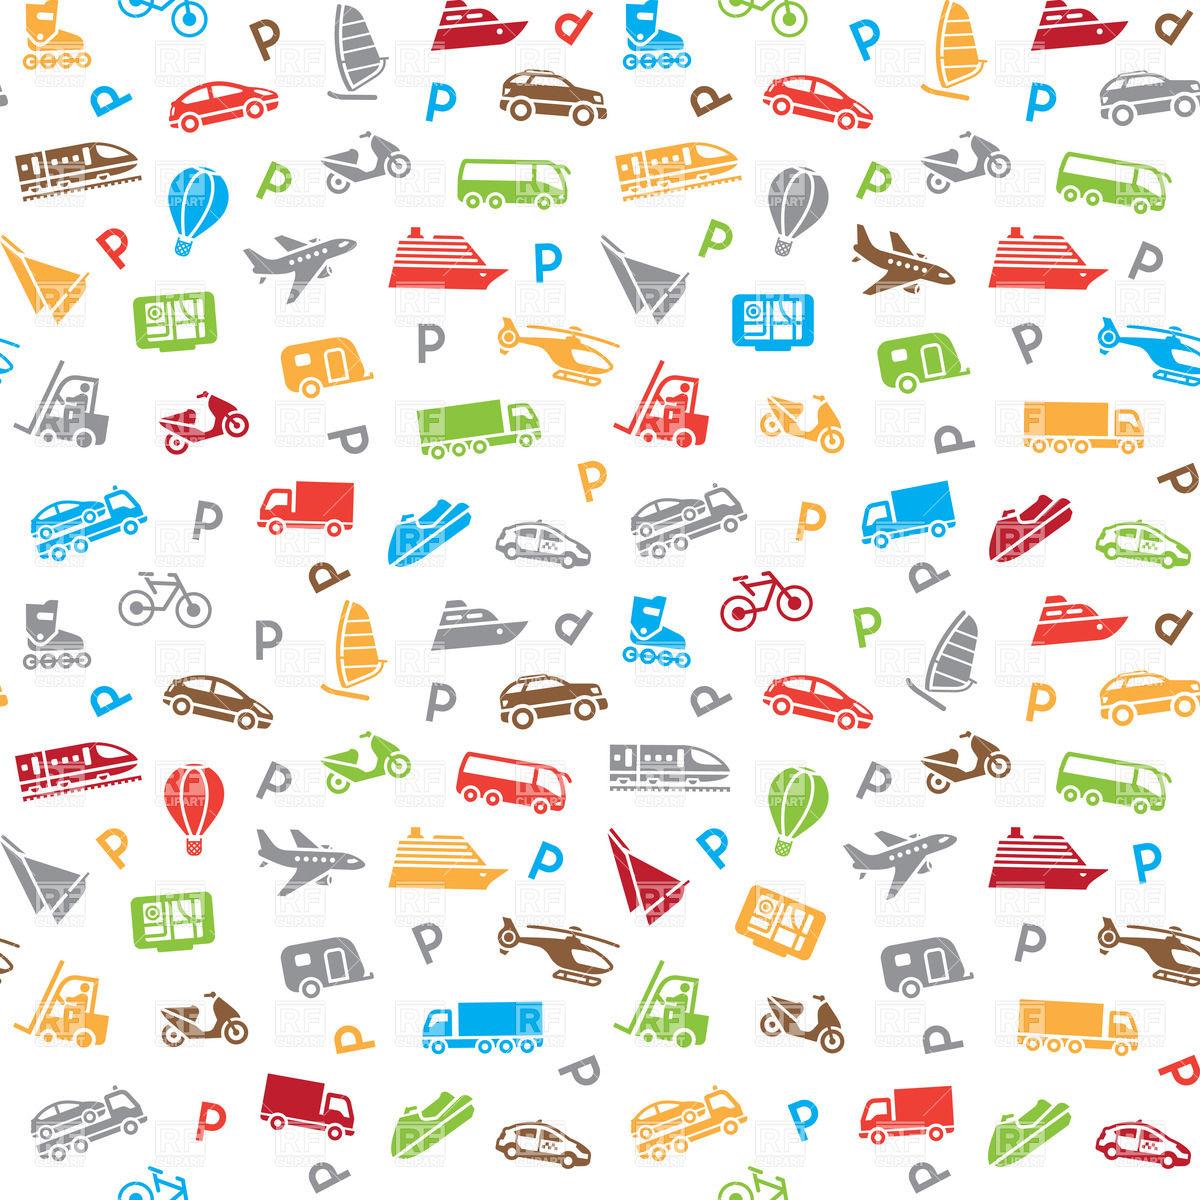 Seamless transport pattern wallpaper 18022 download royalty free 1200x1200